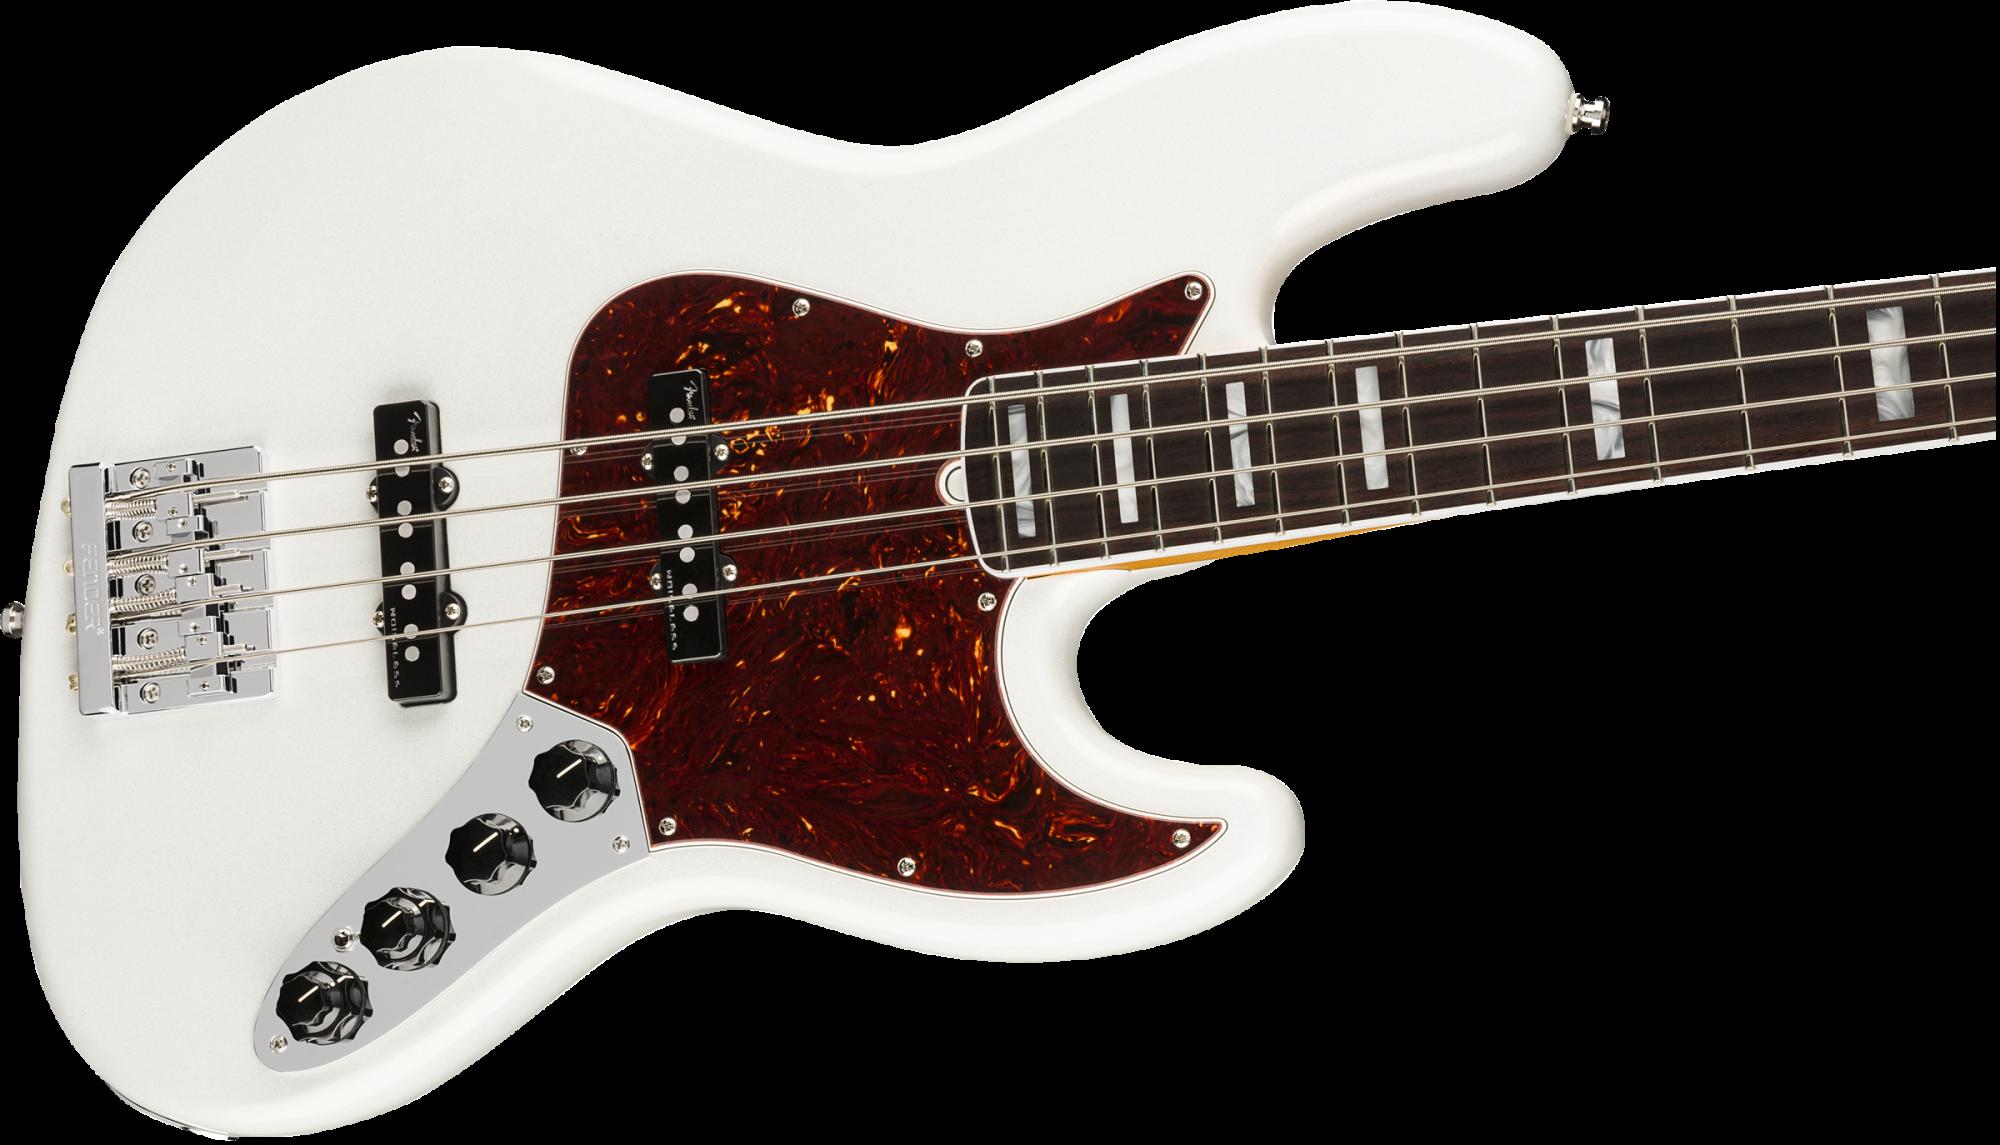 Fender American Ultra Jazz Bass Rosewood Fingerboard - Arctic Pearl